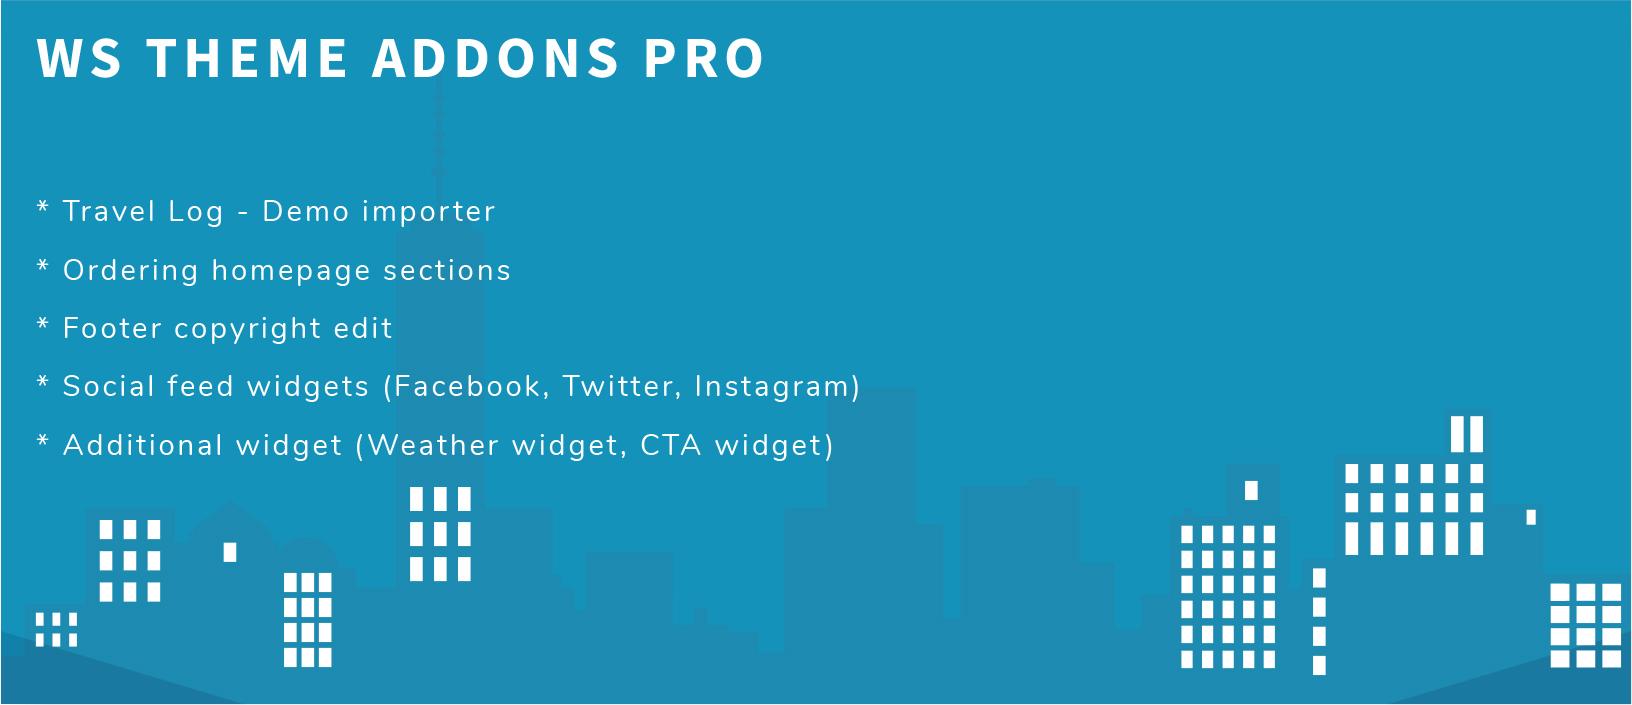 WS Theme Addons Pro